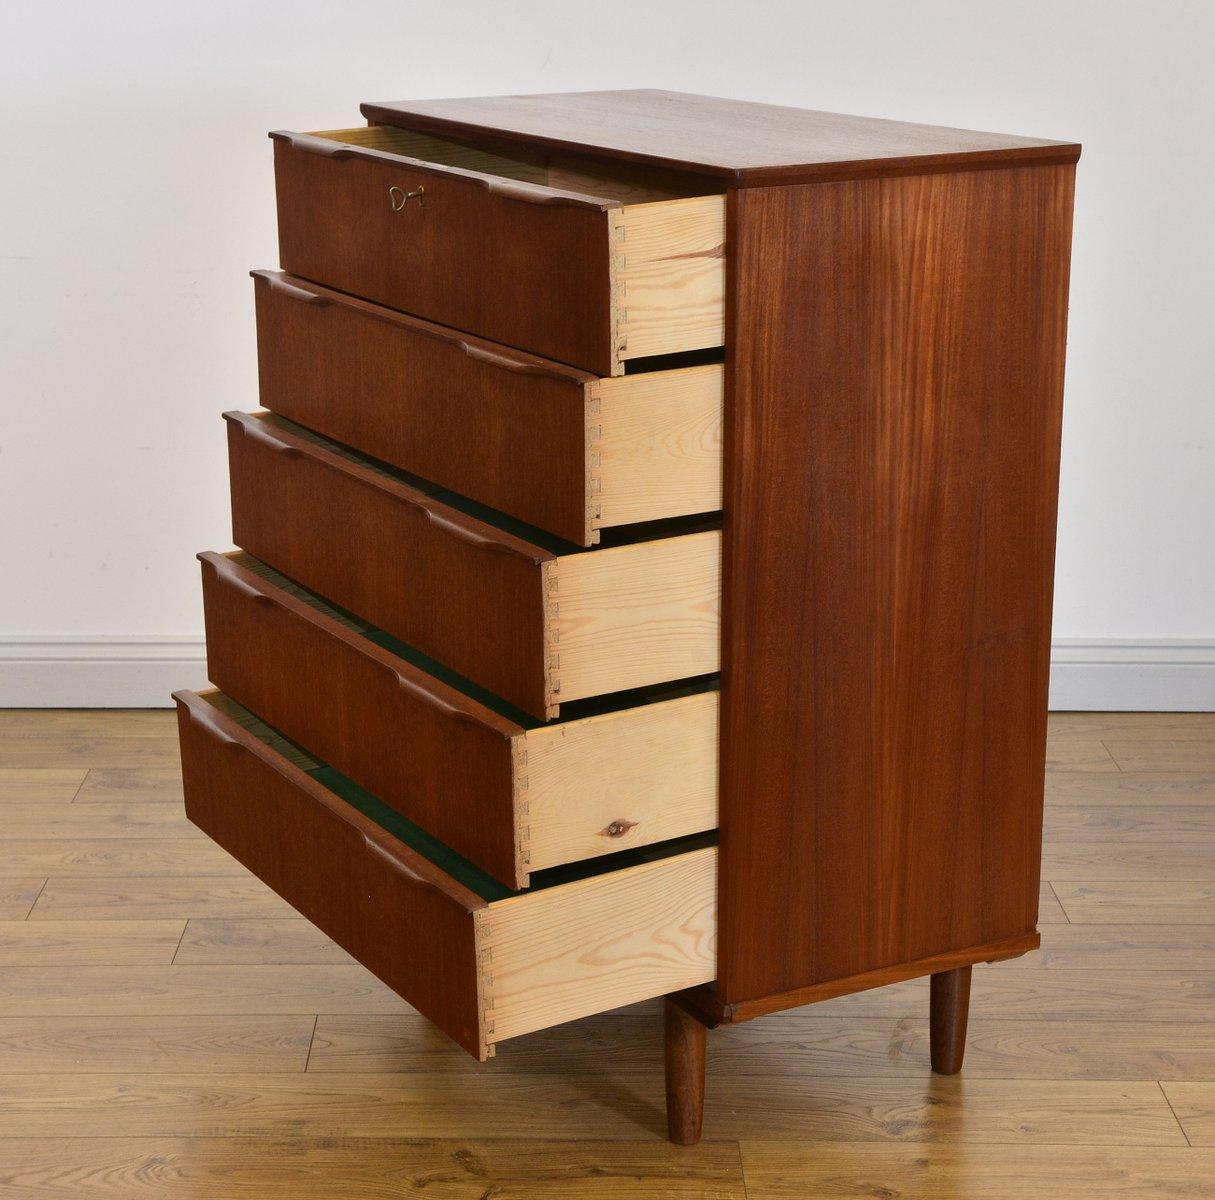 skandinavische mid century kommode aus teak bei pamono kaufen. Black Bedroom Furniture Sets. Home Design Ideas